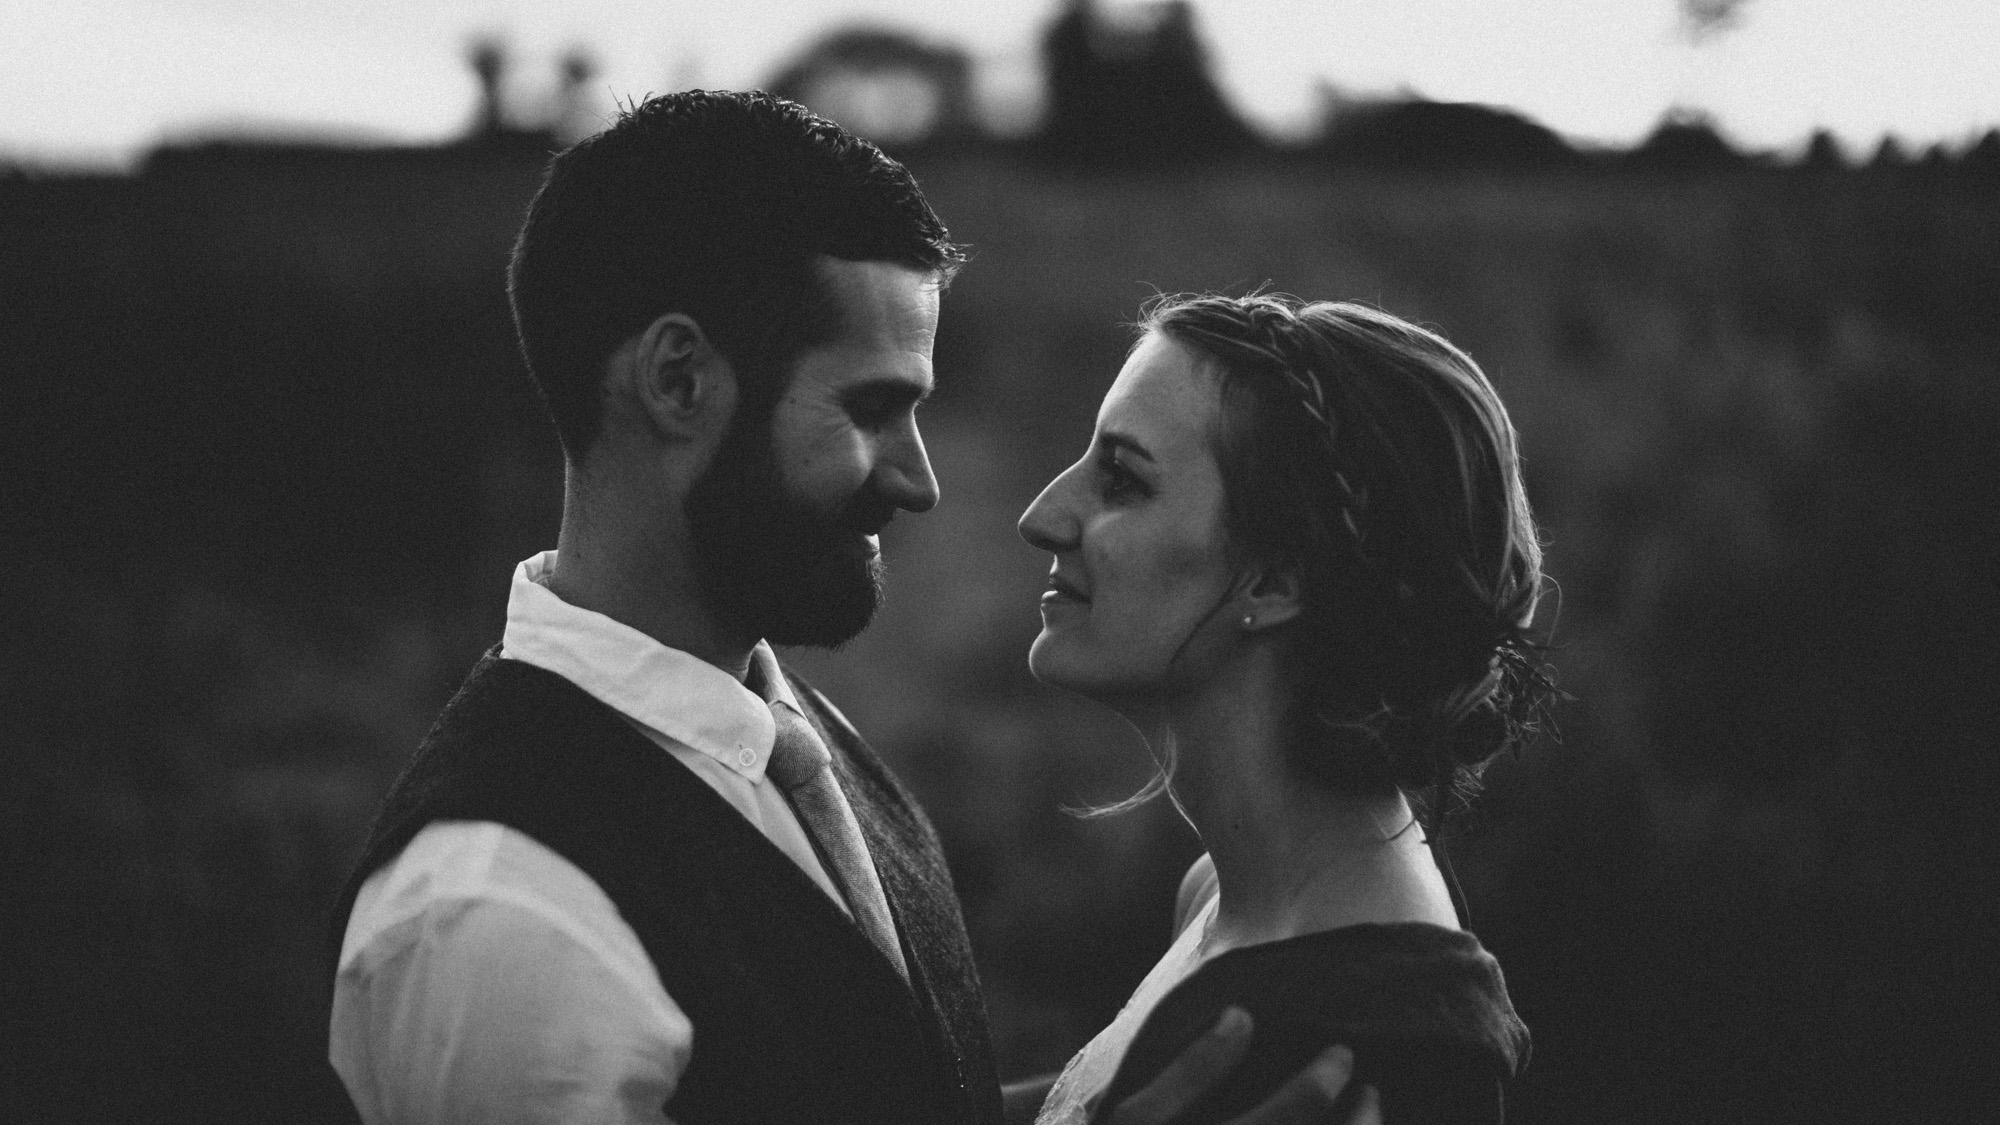 alec_vanderboom_springfield_missouri_wedding-0074.jpg